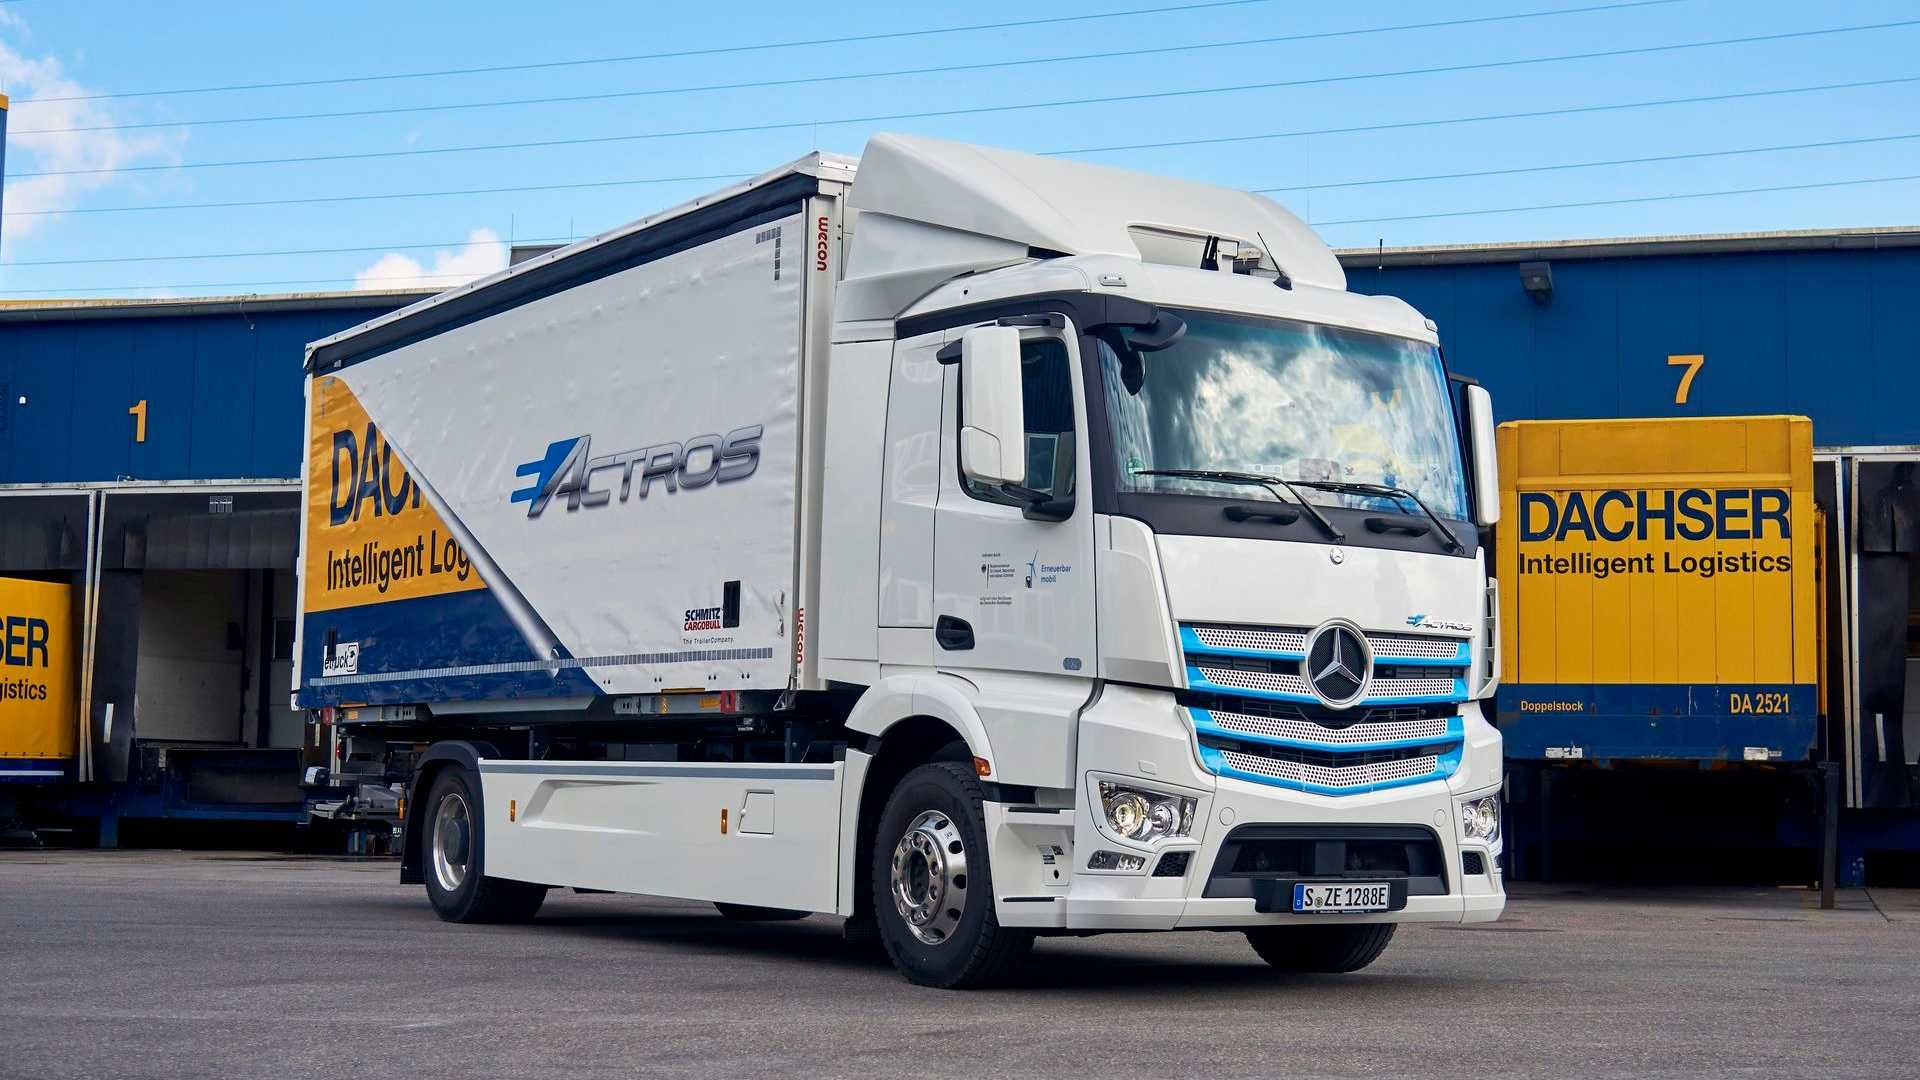 Mercedes Benz Eactros Logistics